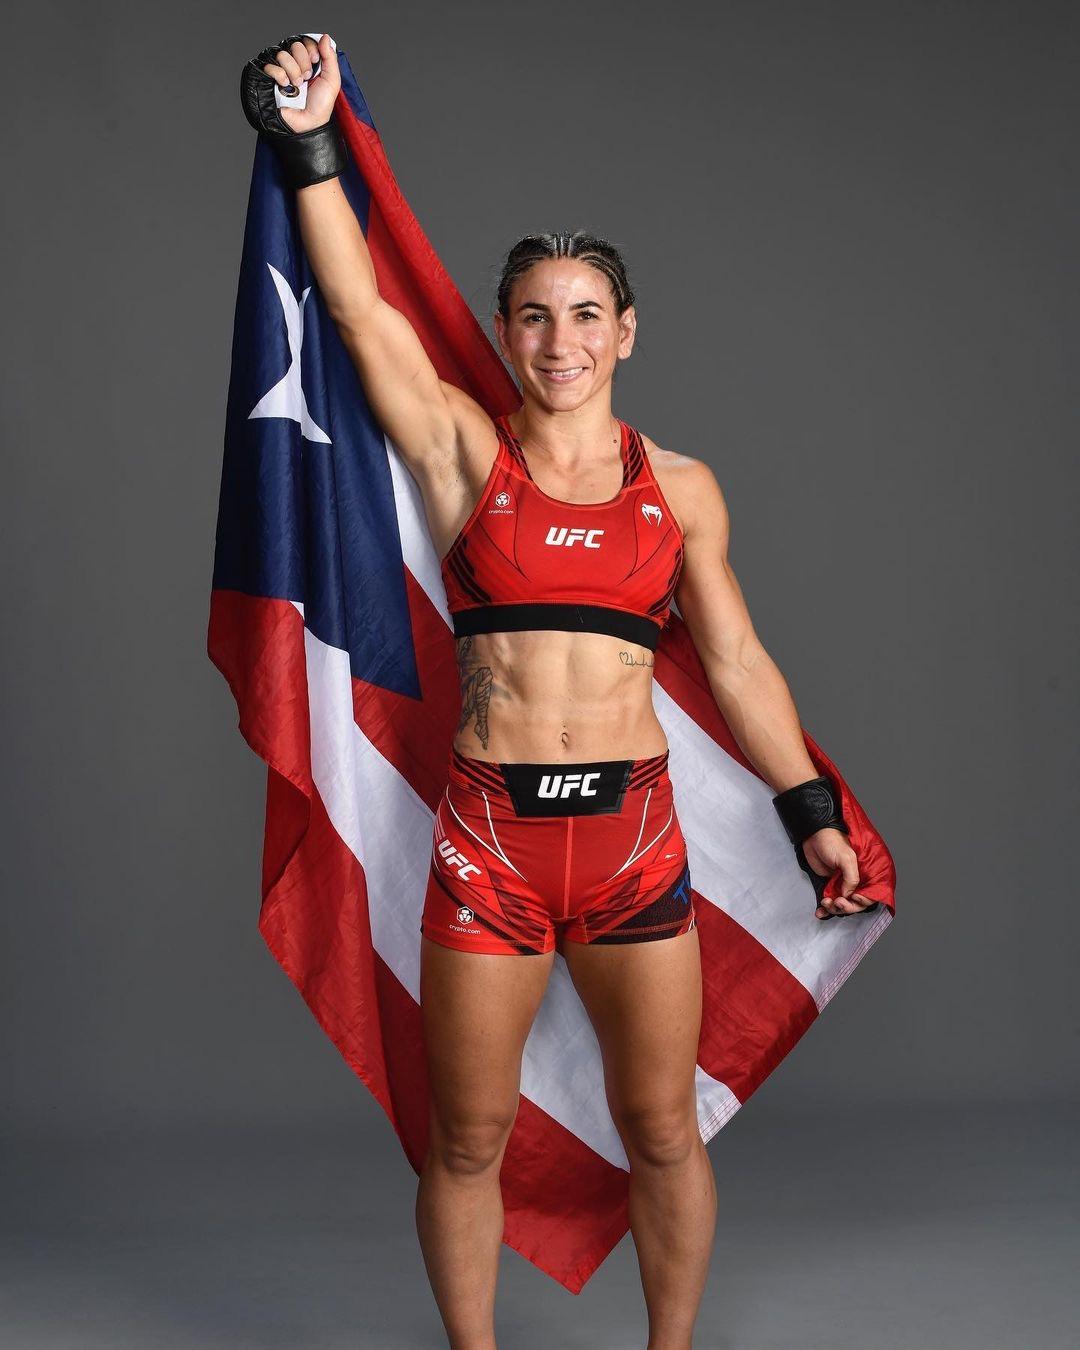 Ziggy's Naturals Signs Endorsement Deal with UFC Fighter Tecia Torres